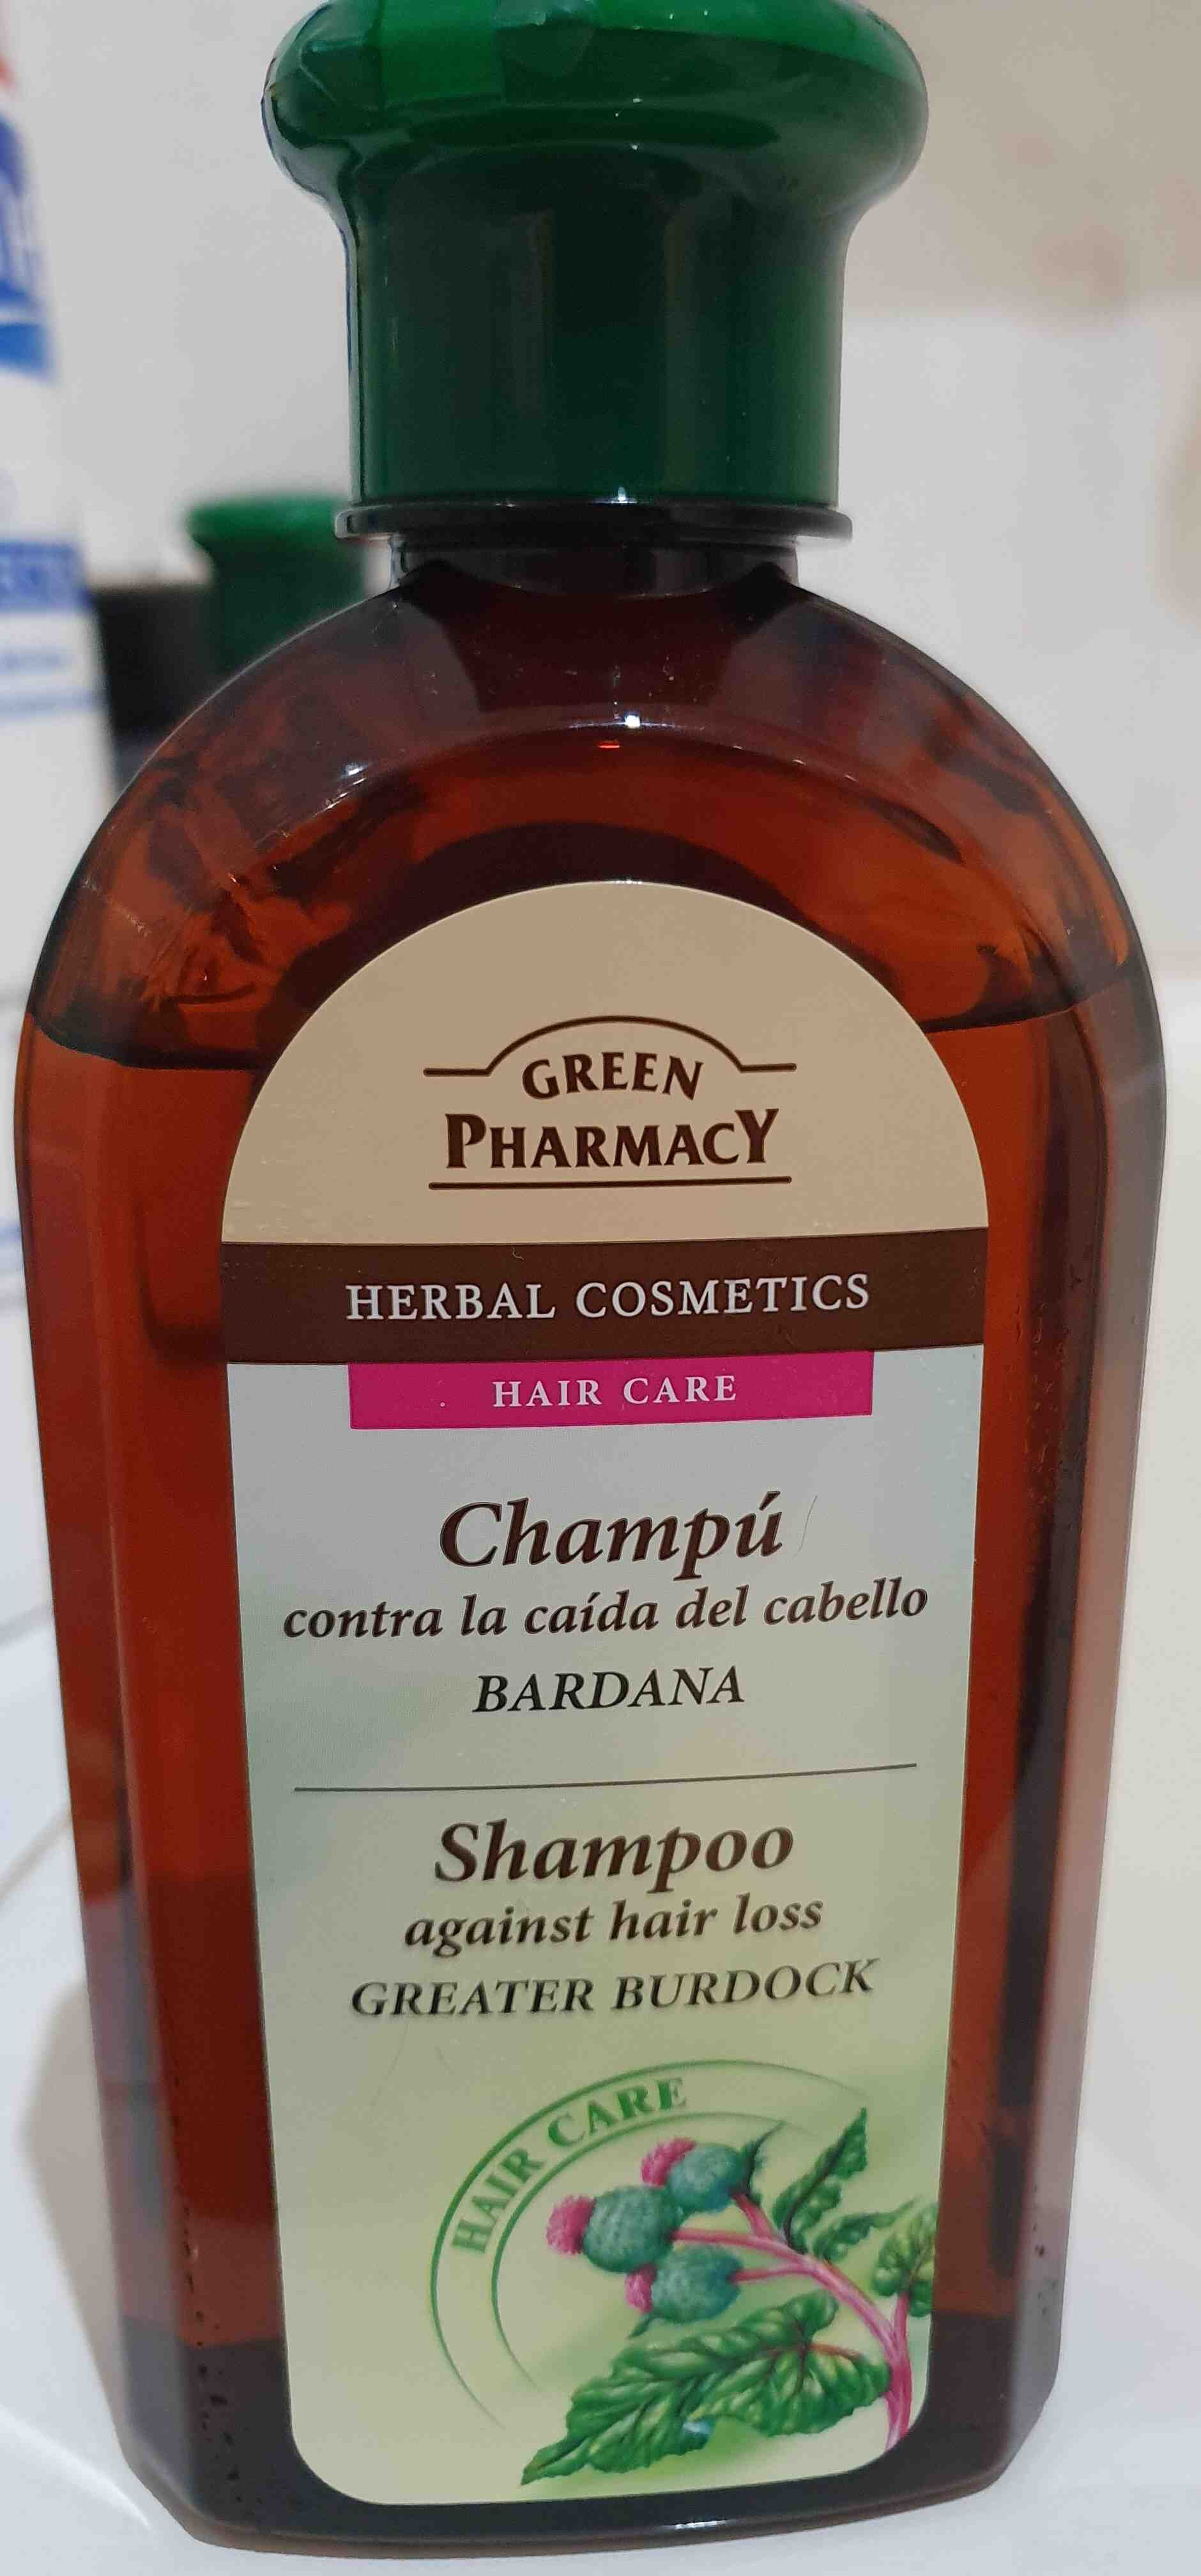 Champu contra la caida de cabello bardana - Product - en